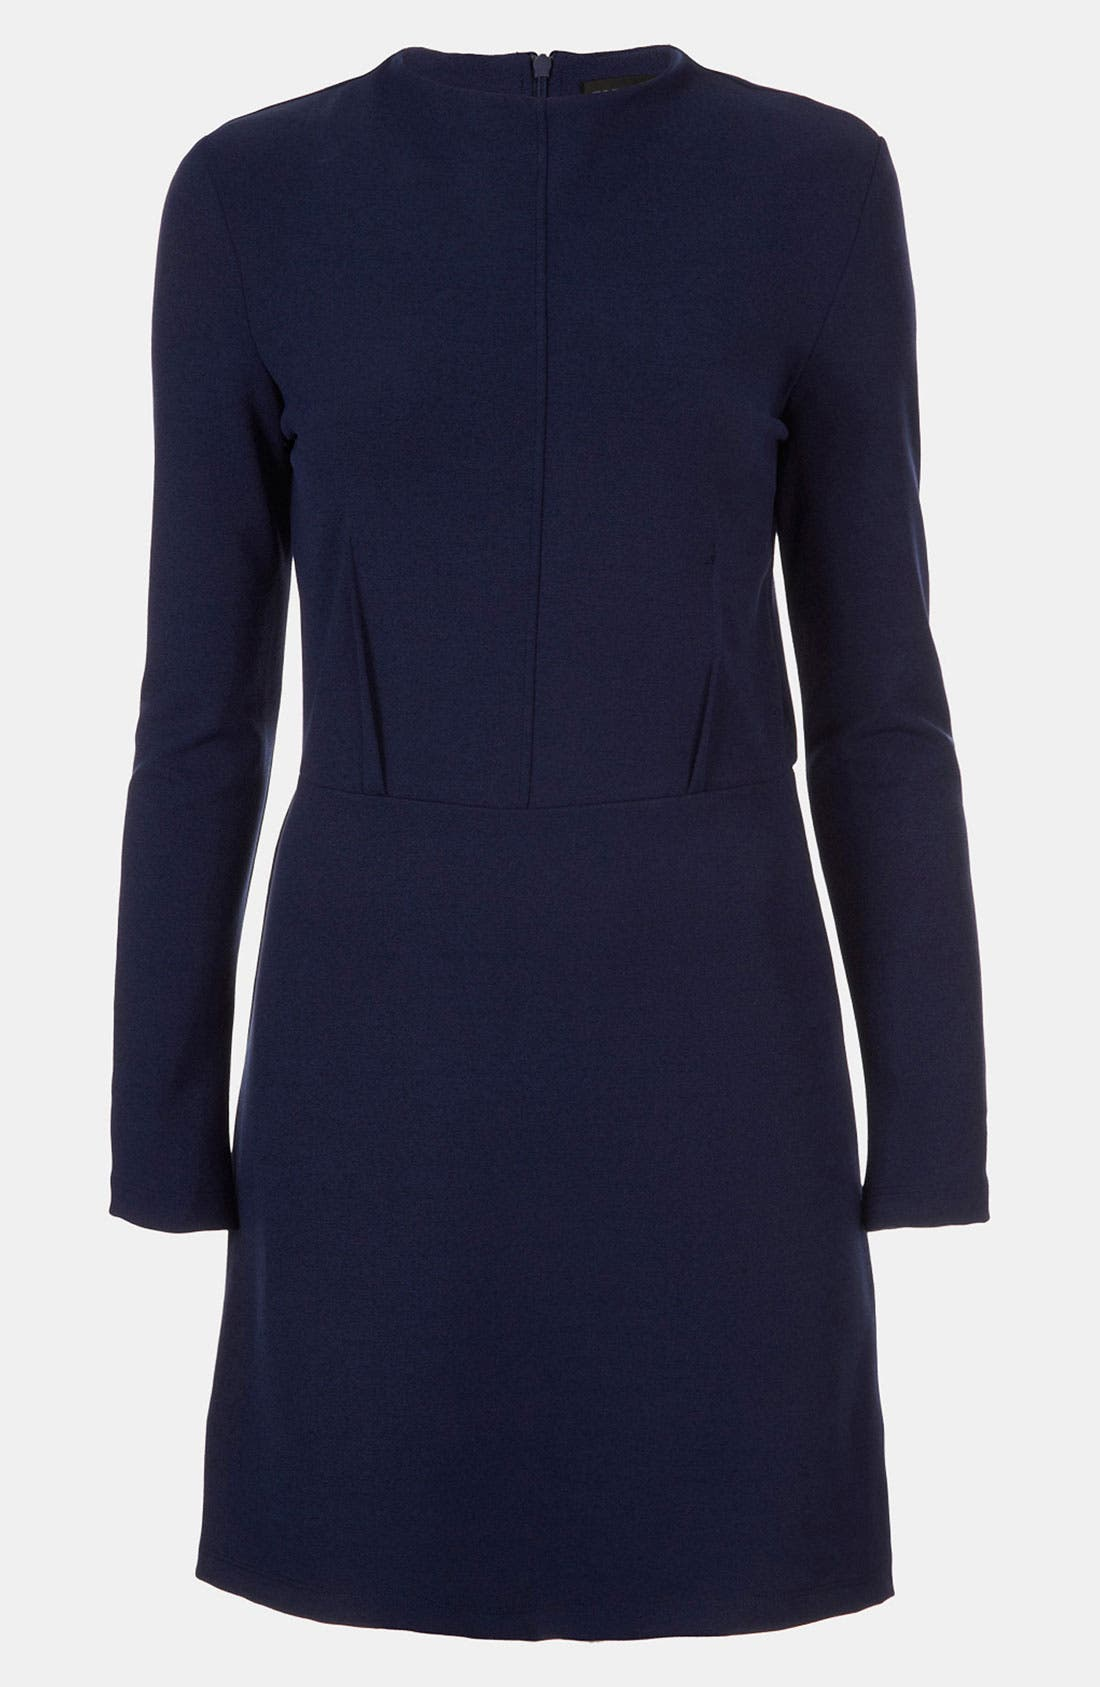 Main Image - Topshop High Neck Ponte Dress